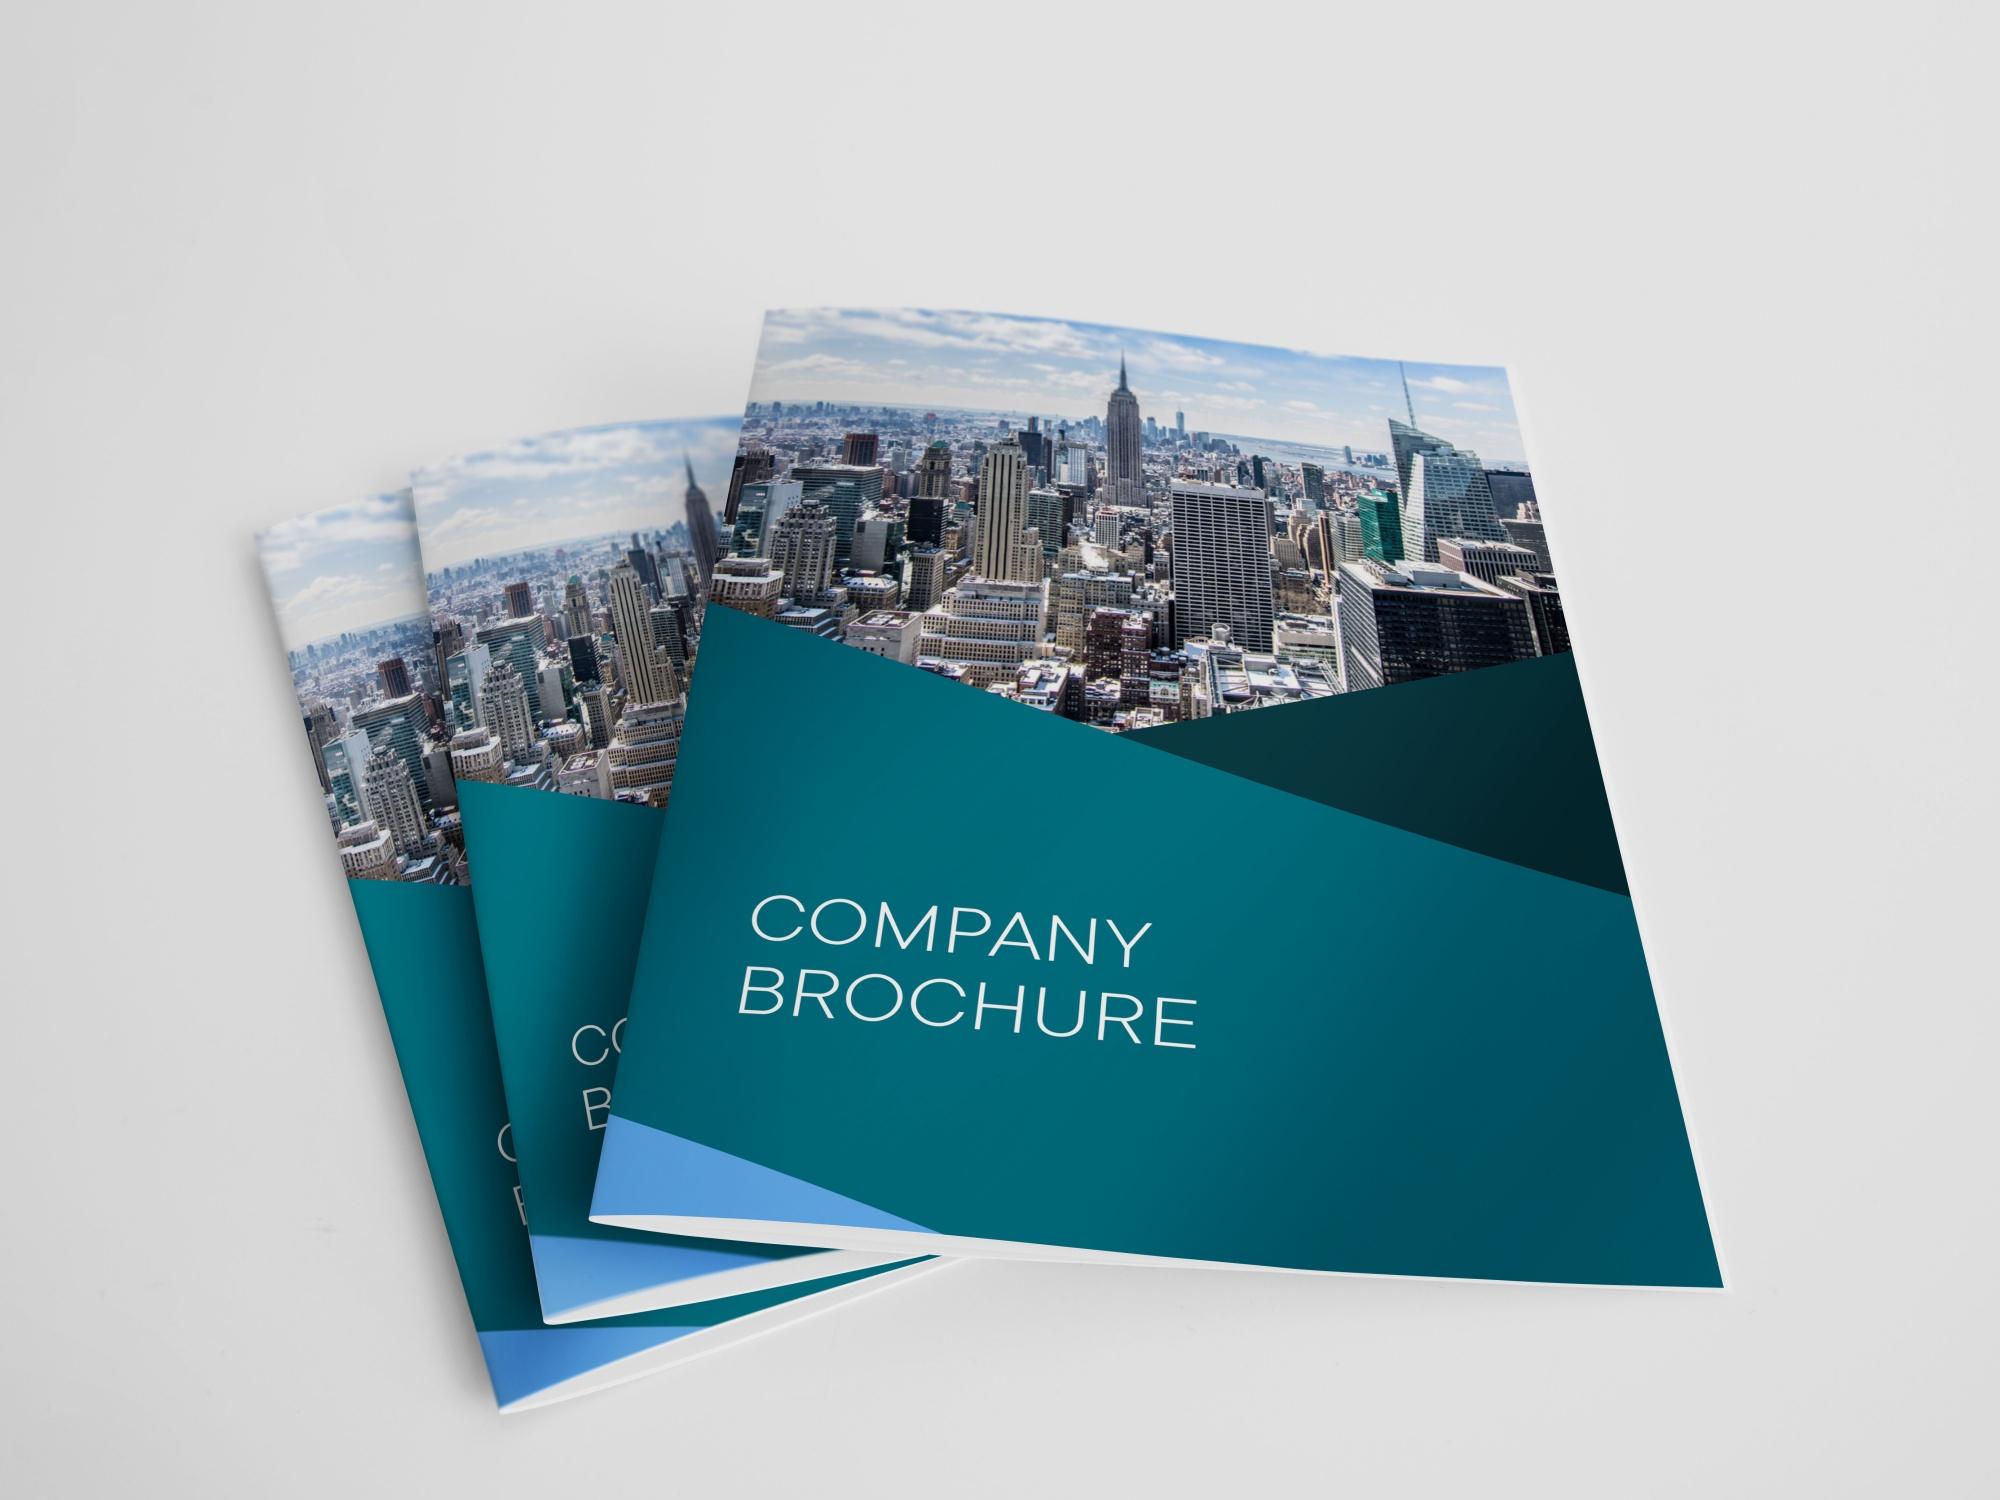 A4 Bi-fold brochures made by Kiakiaprint